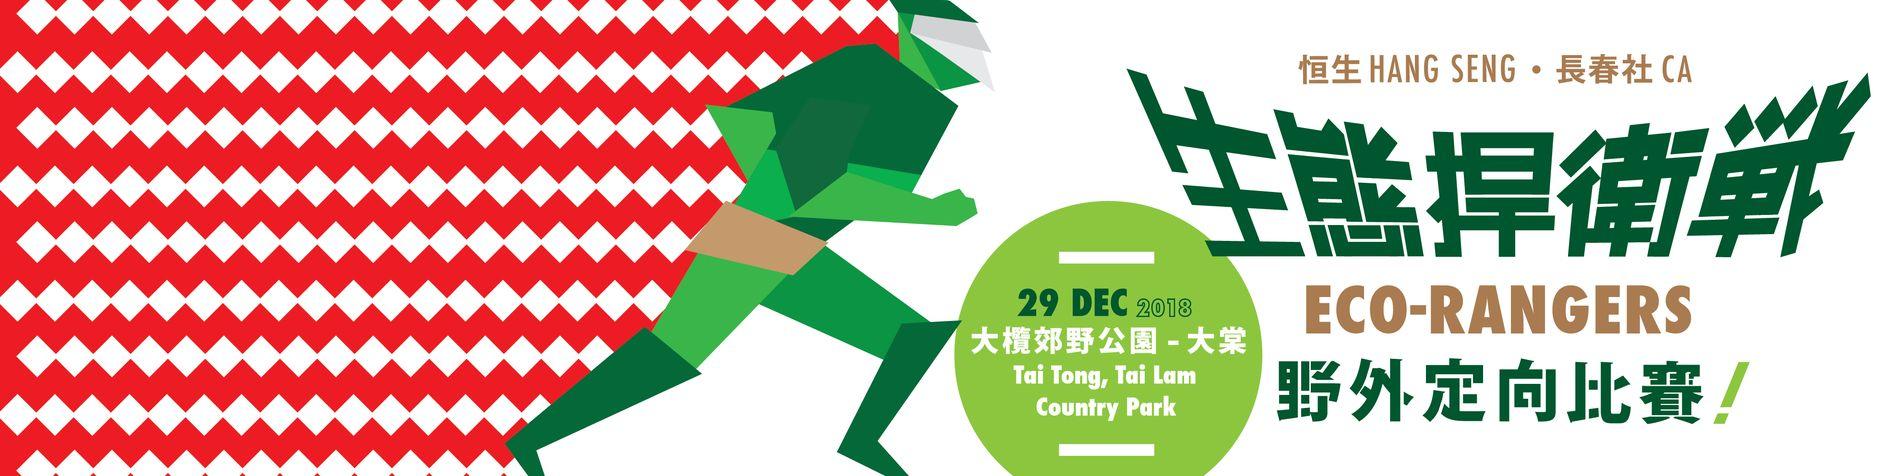 Hang Seng – CA Eco-Rangers 2018